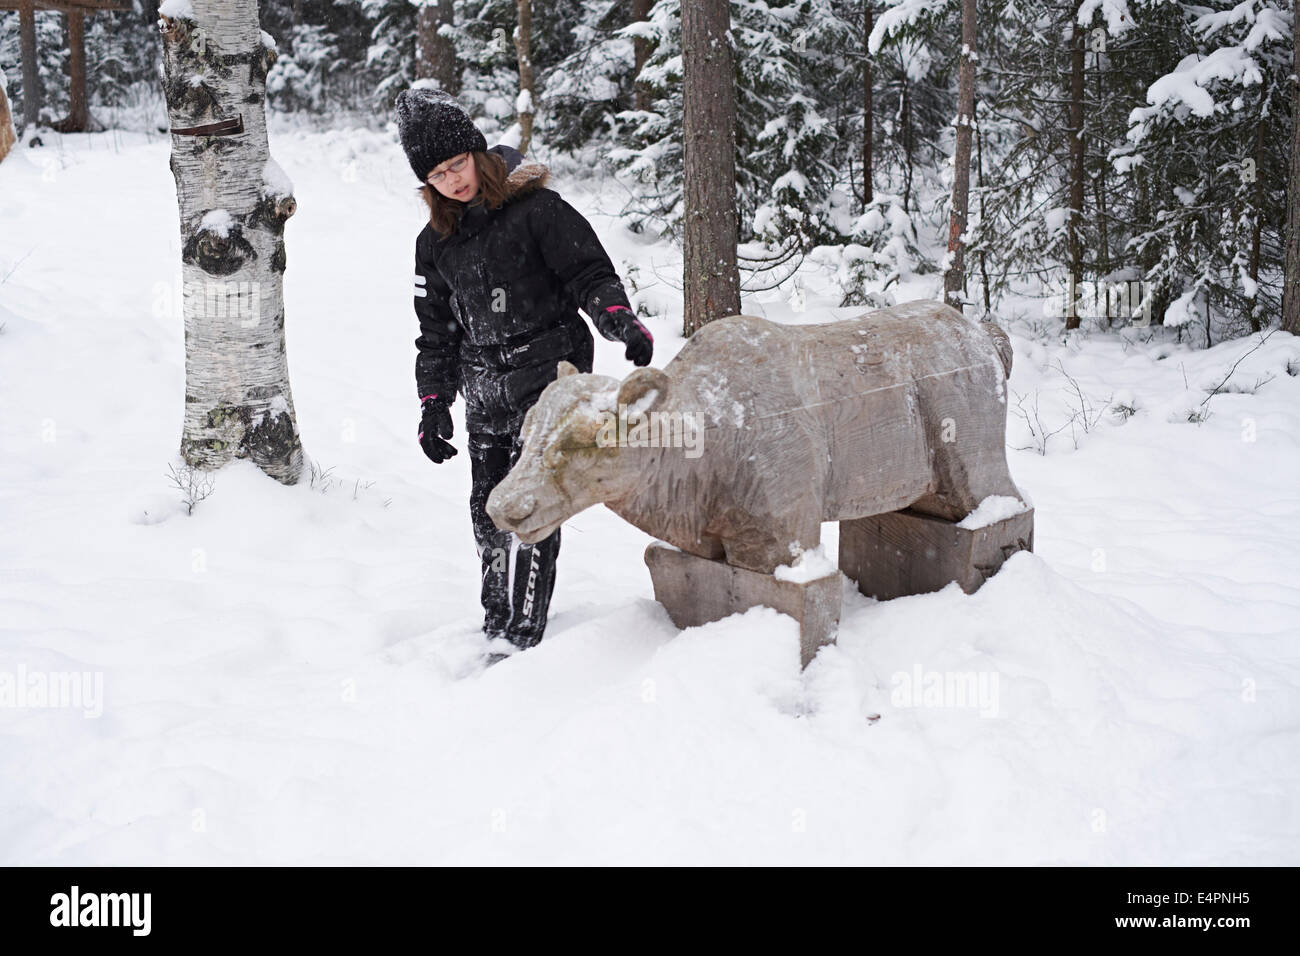 UMEA, northern Sweden. Sami camp indigenous people. - Stock Image